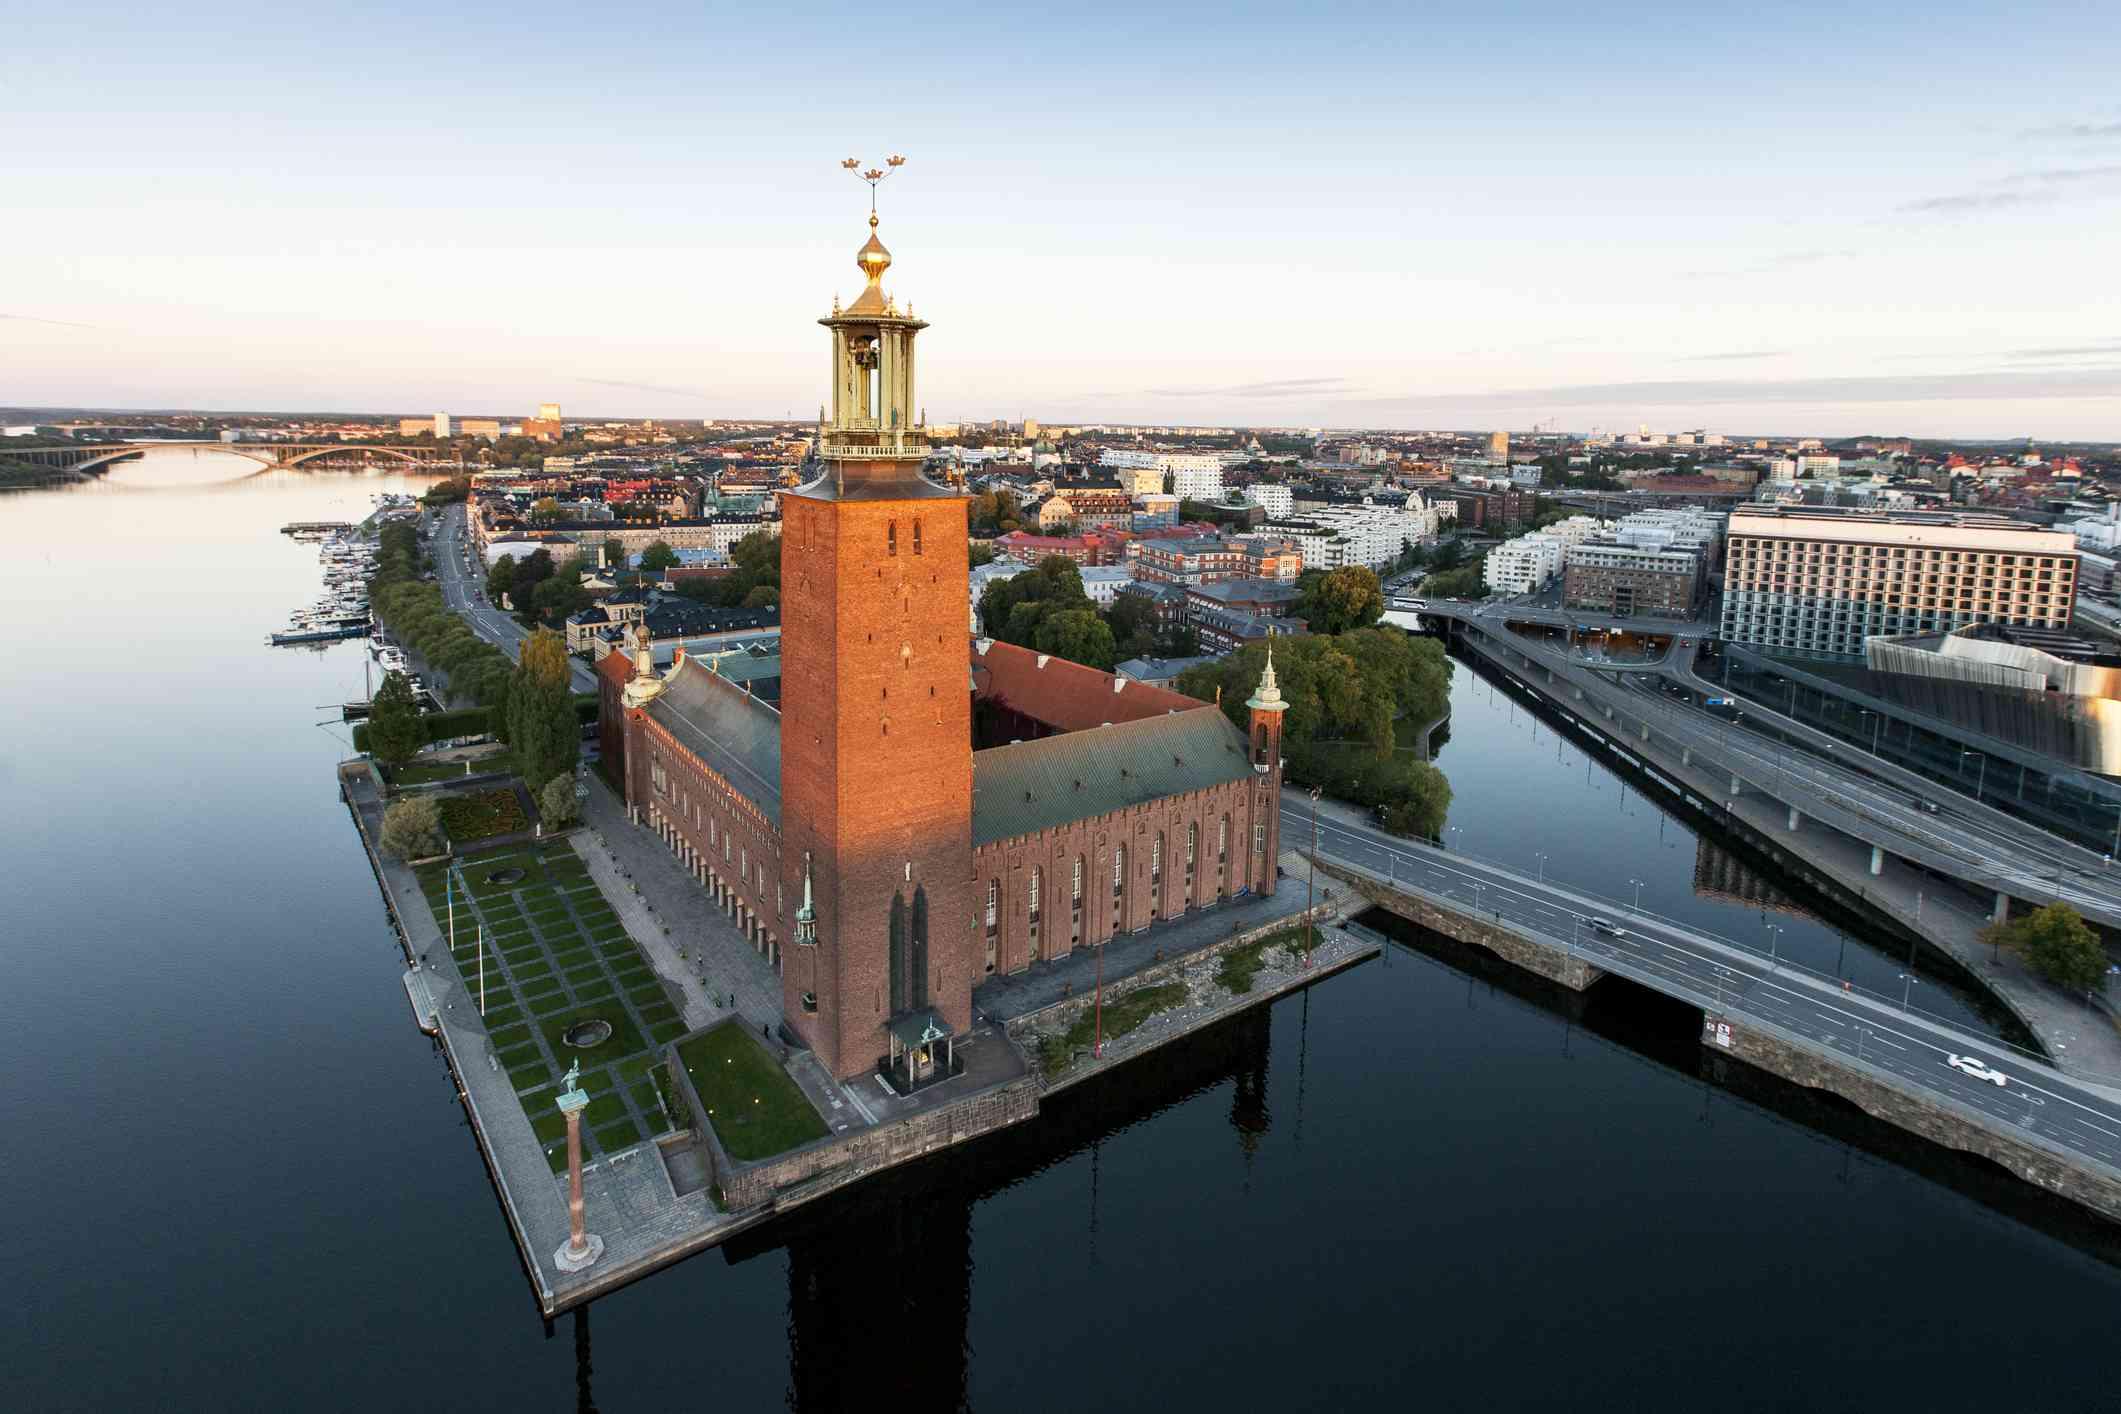 A city view including Stockholm City Hall